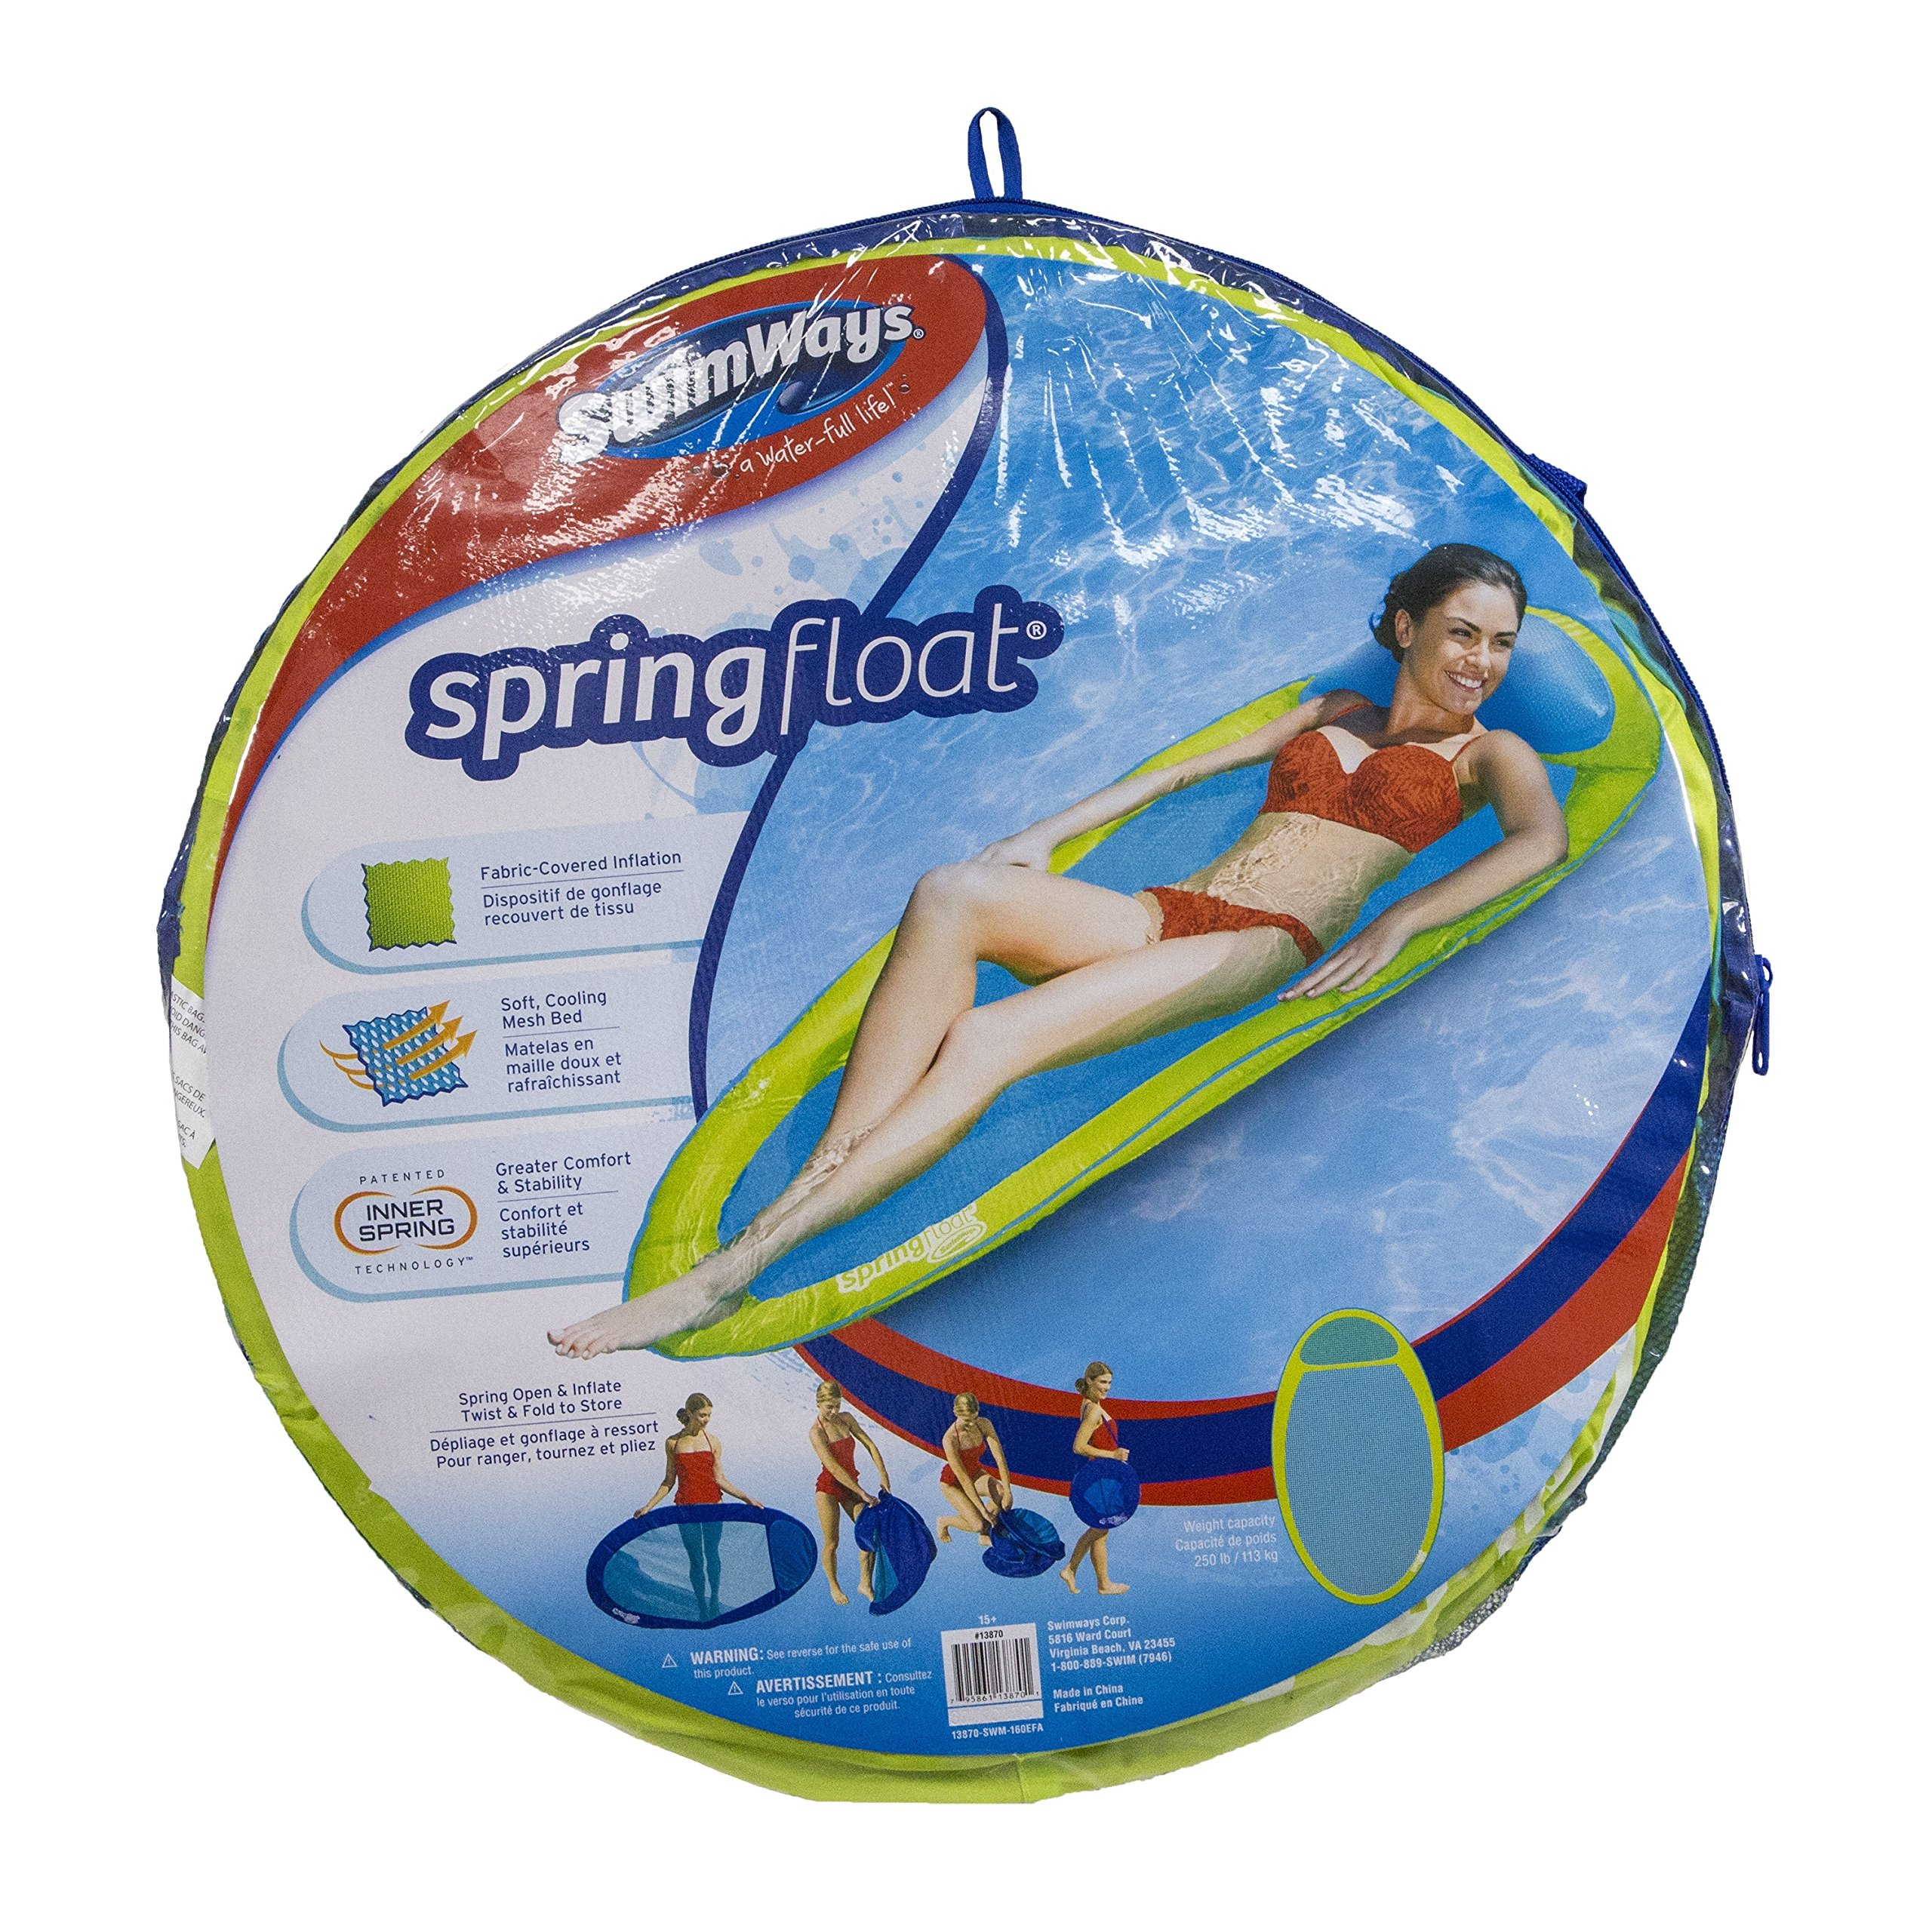 SwimWays Original Spring Float - Floating Swim Hammock for Pool or Lake - Lime/Light Blue by SwimWays (Image #5)